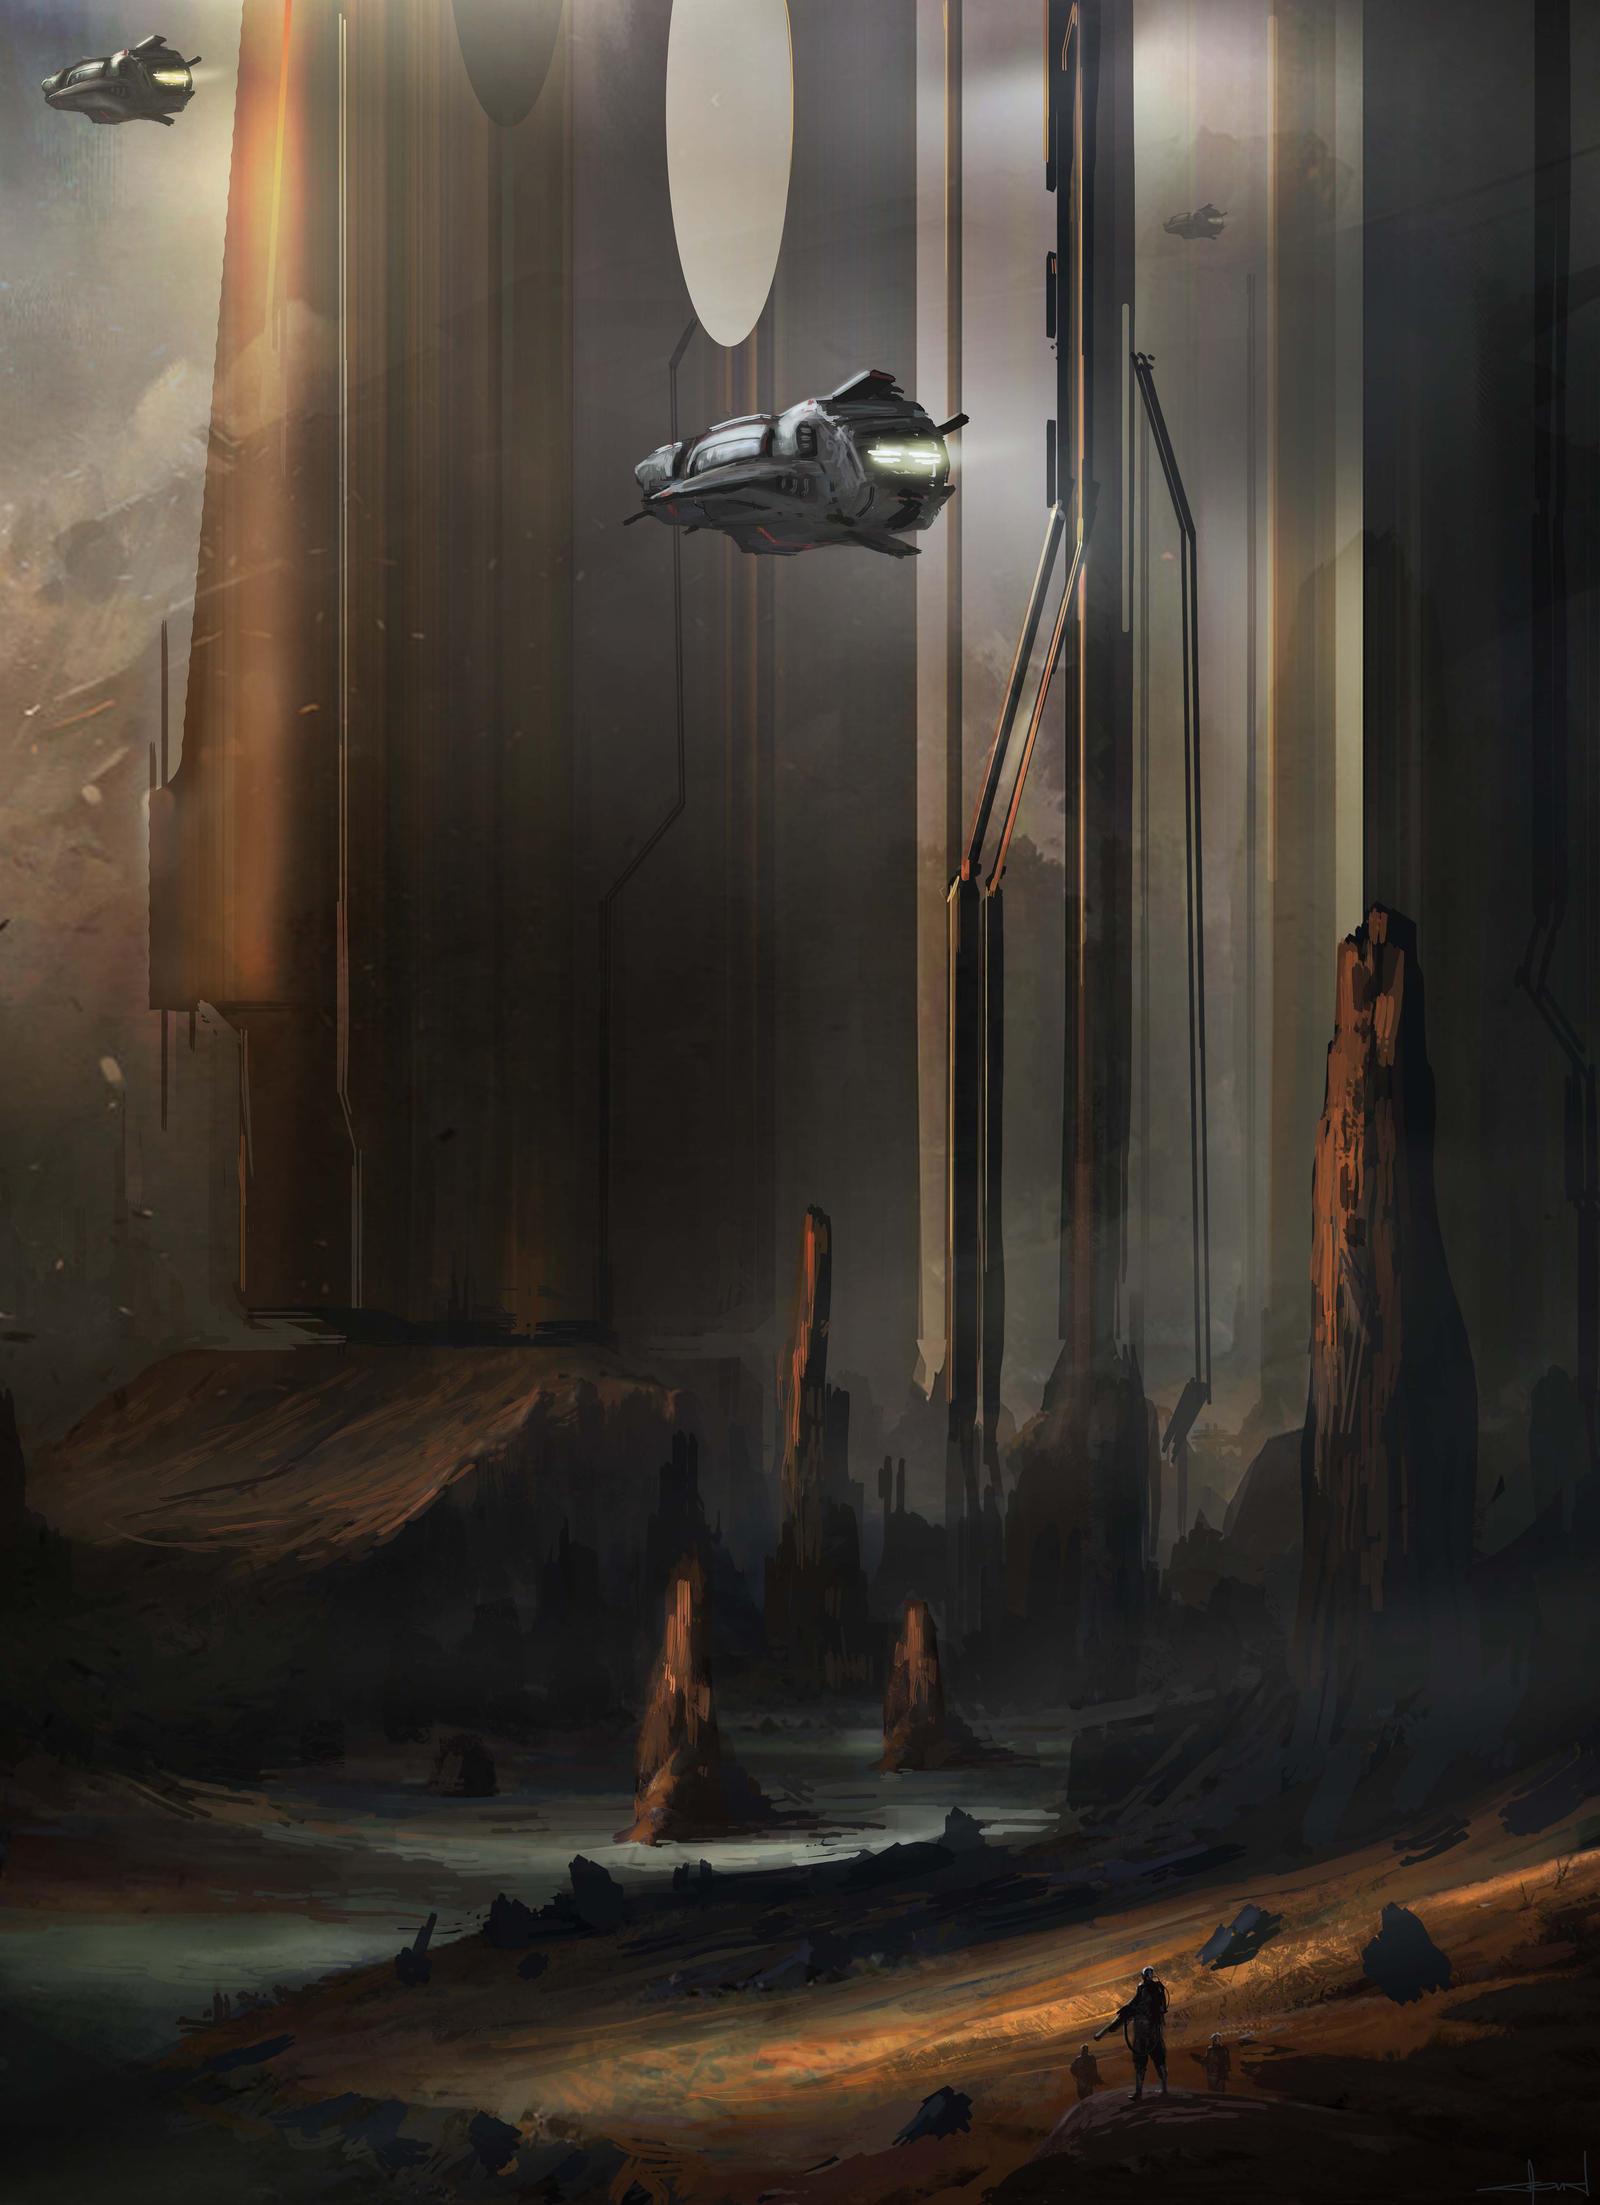 Forge by Darkcloud013